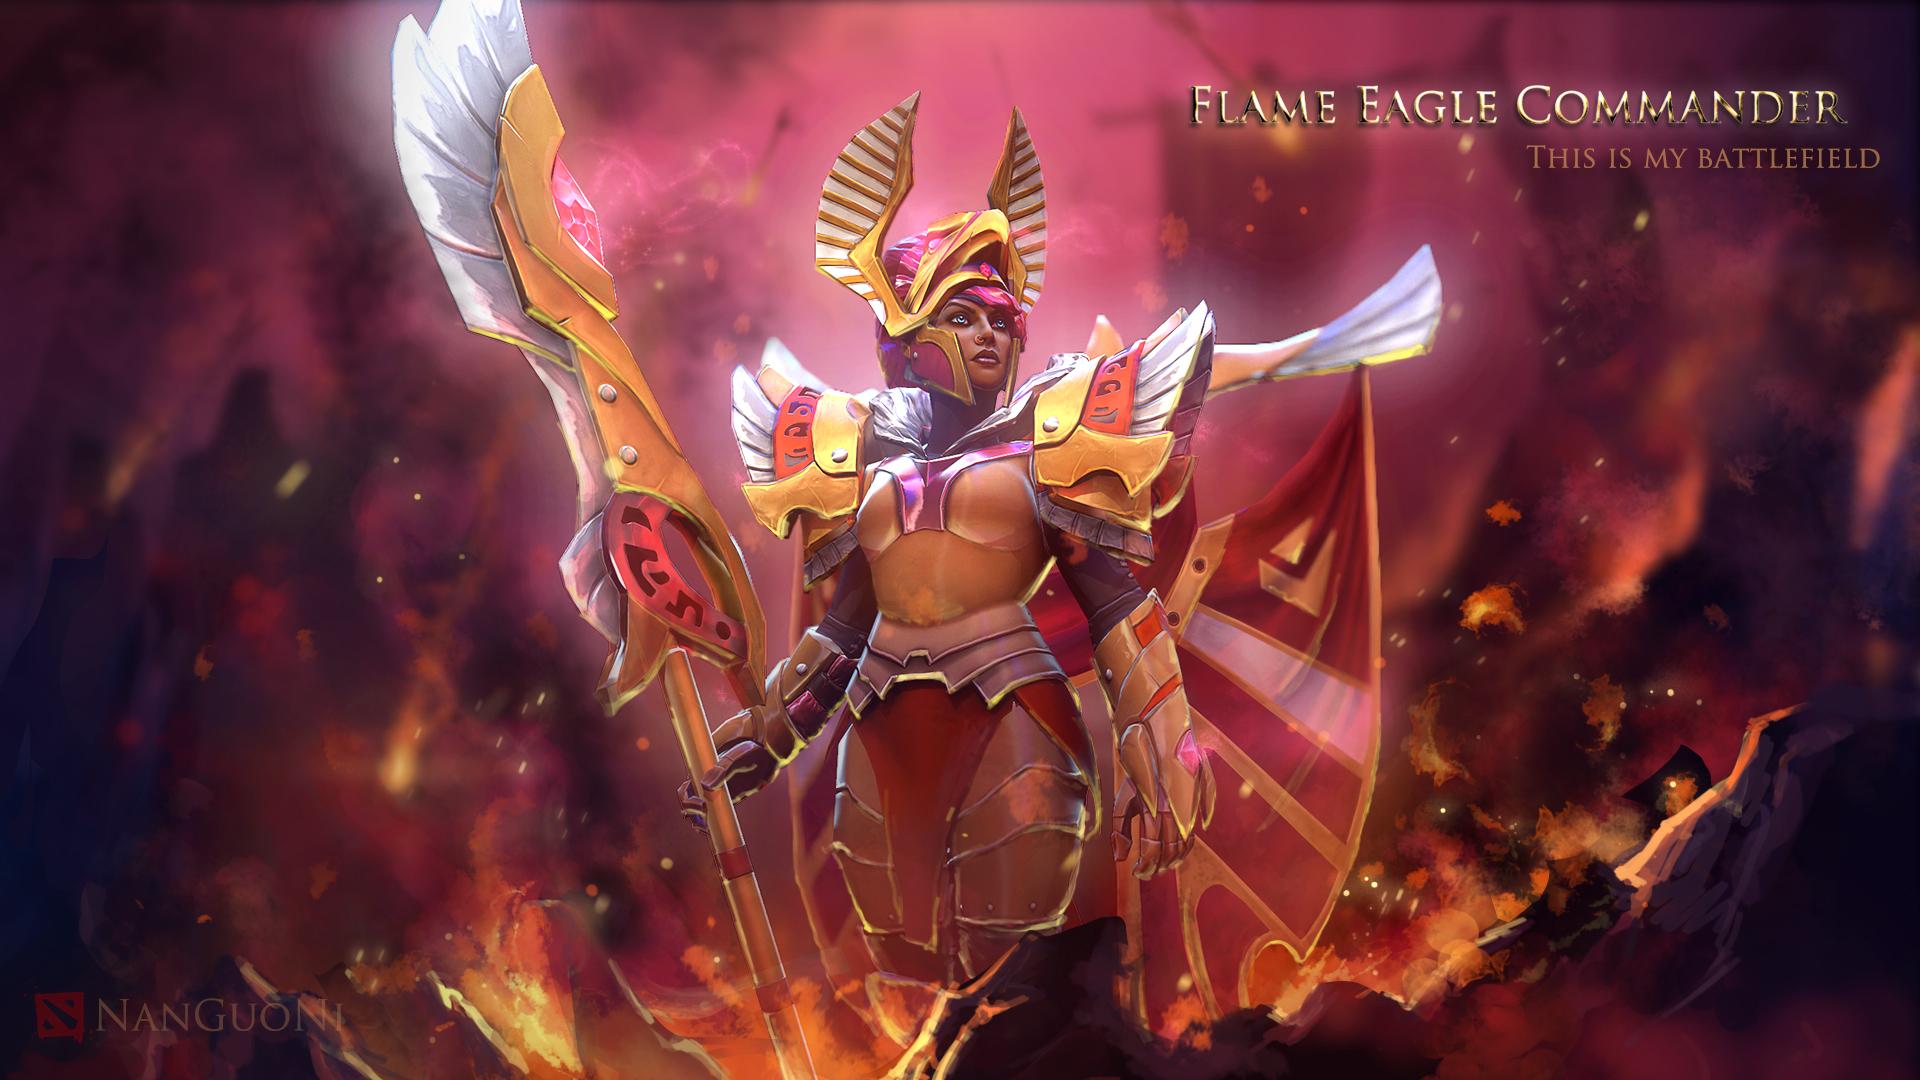 Pubg Loading Screen Wallpaper Hd: Steam Workshop :: Flame Eagle Commander